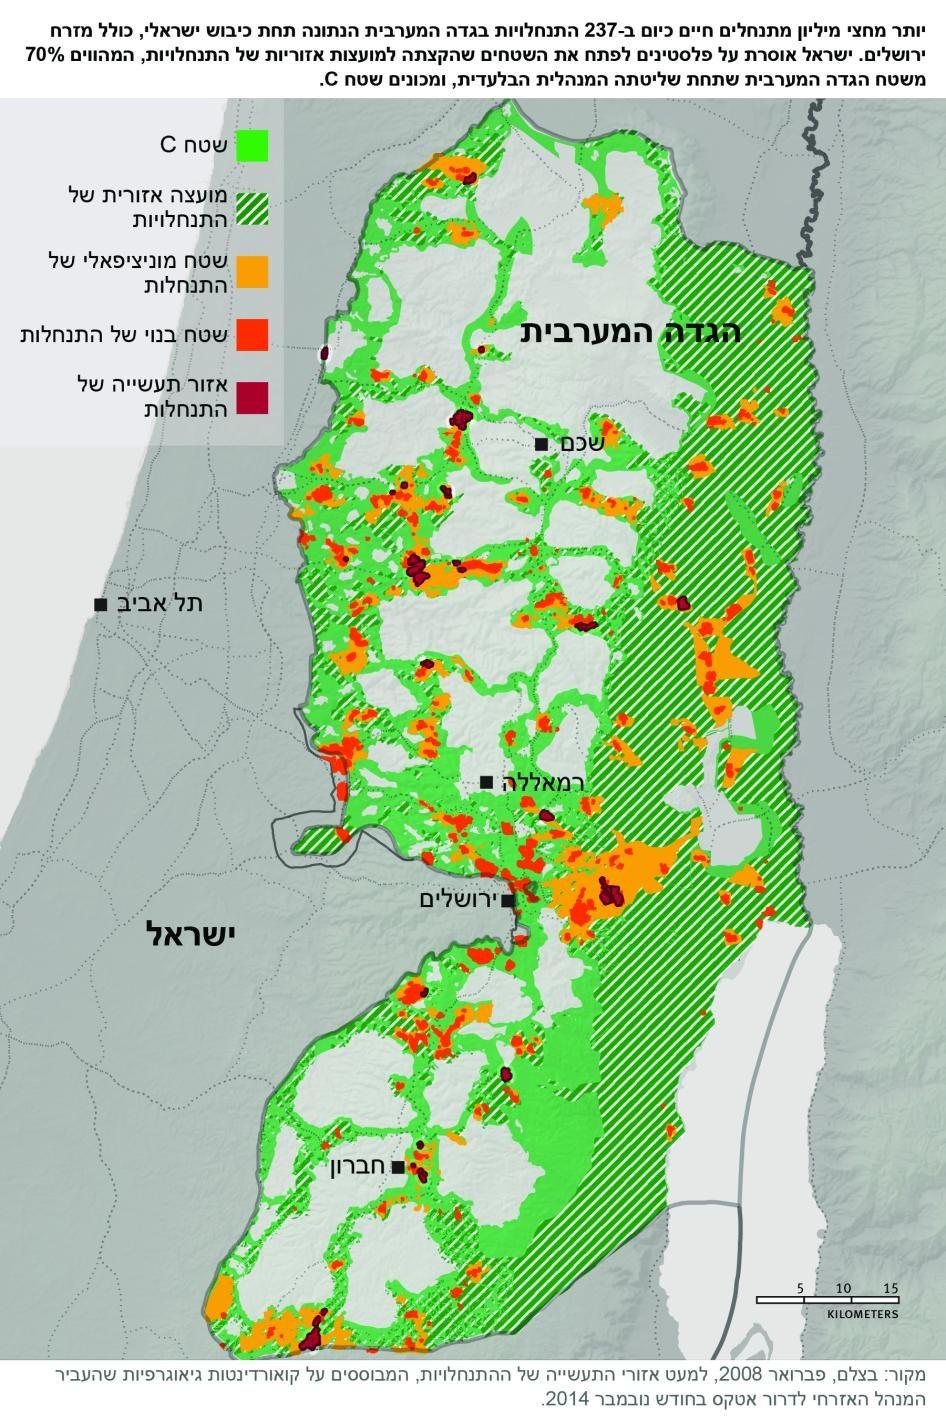 Map of Israel/Palestine